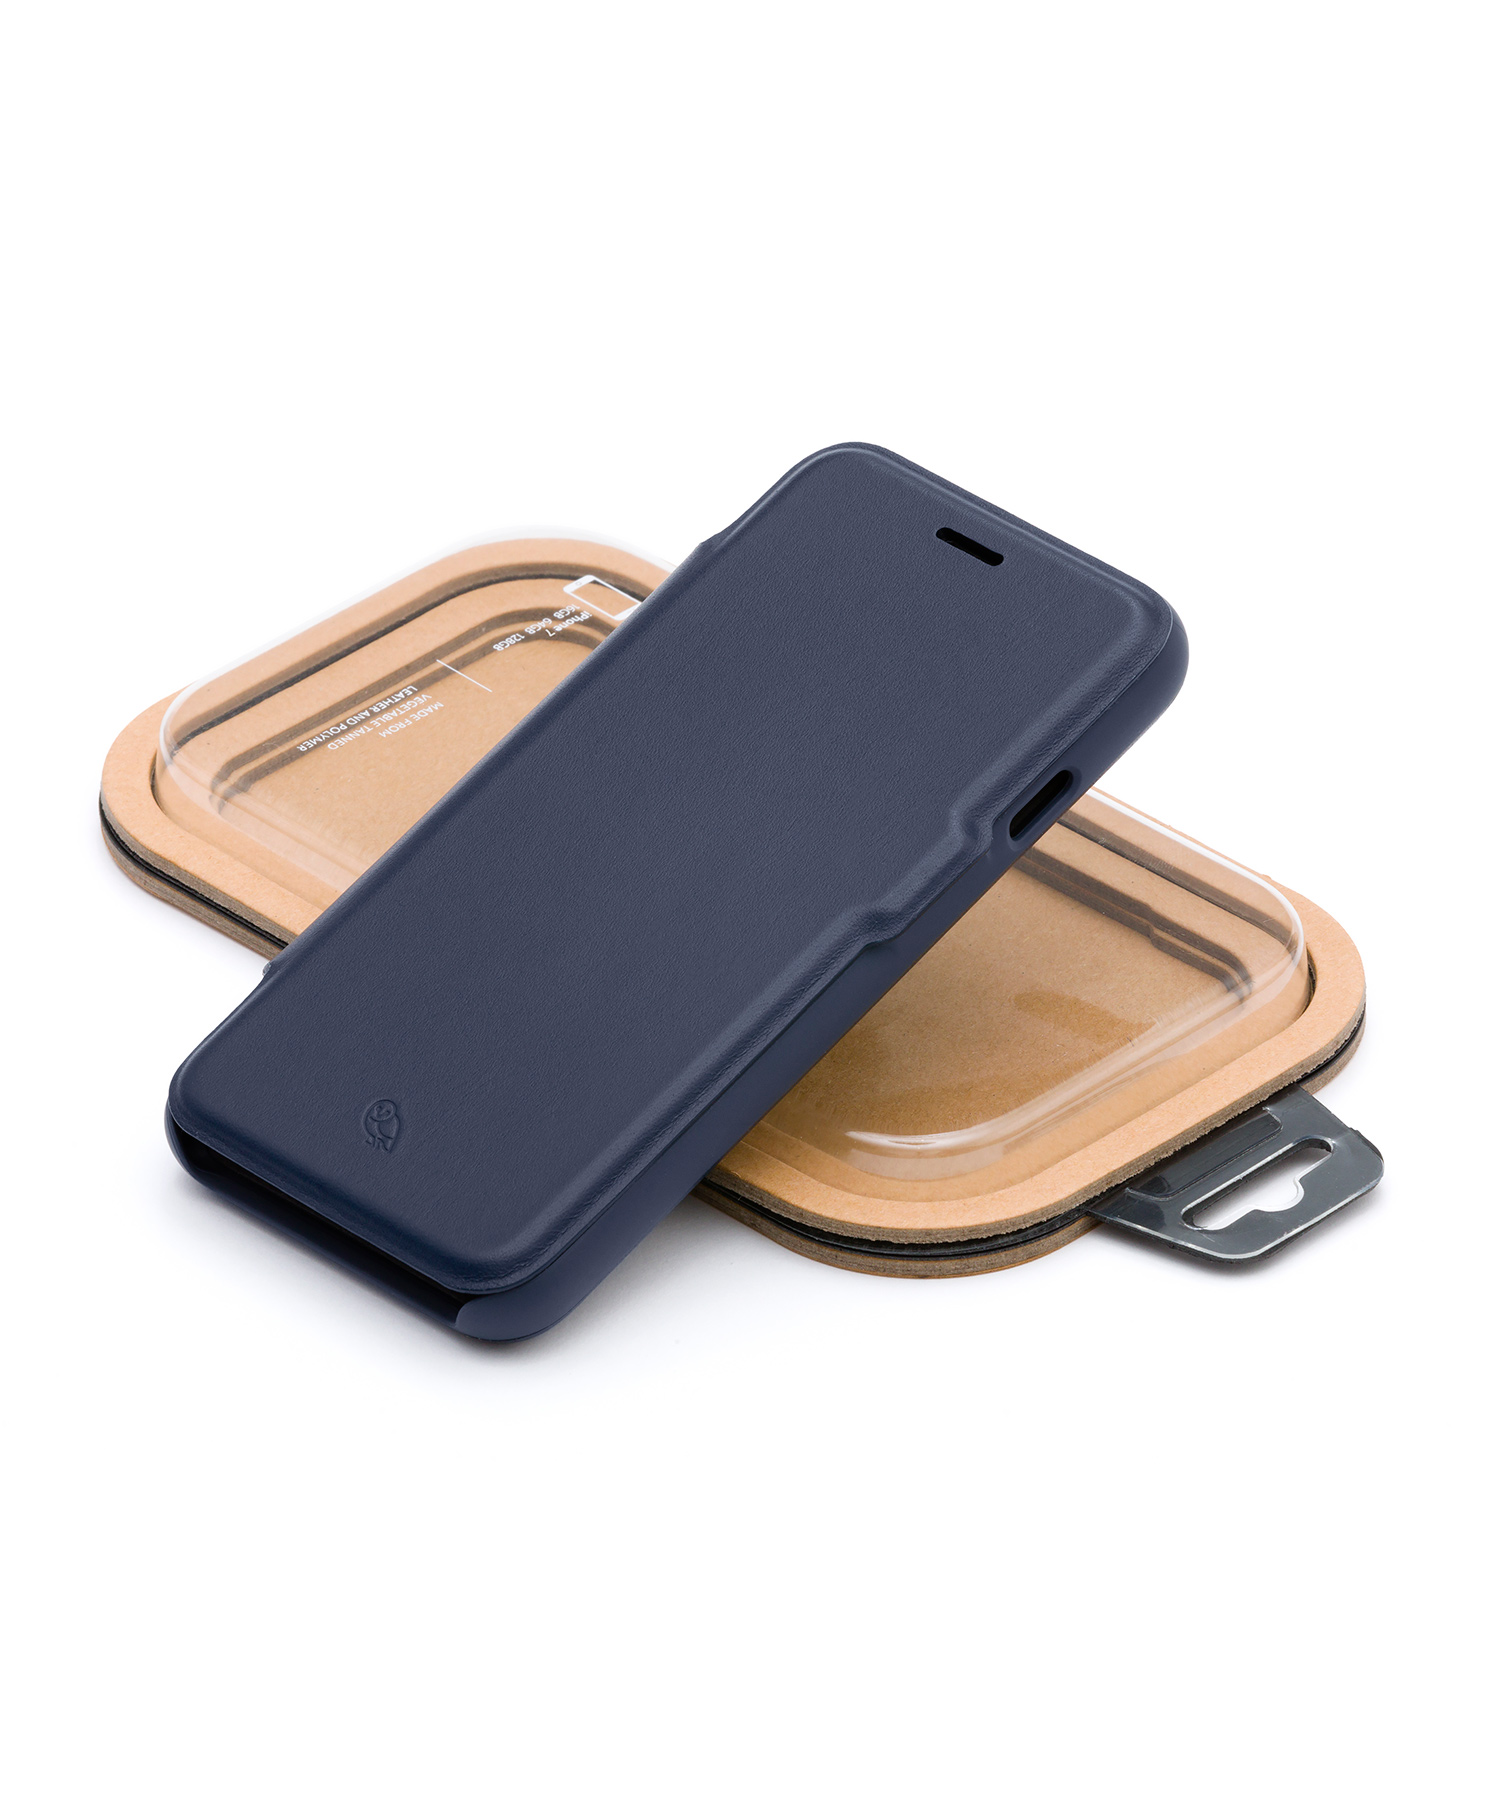 Bellroy Phone Wallet <iPhone 7/8>